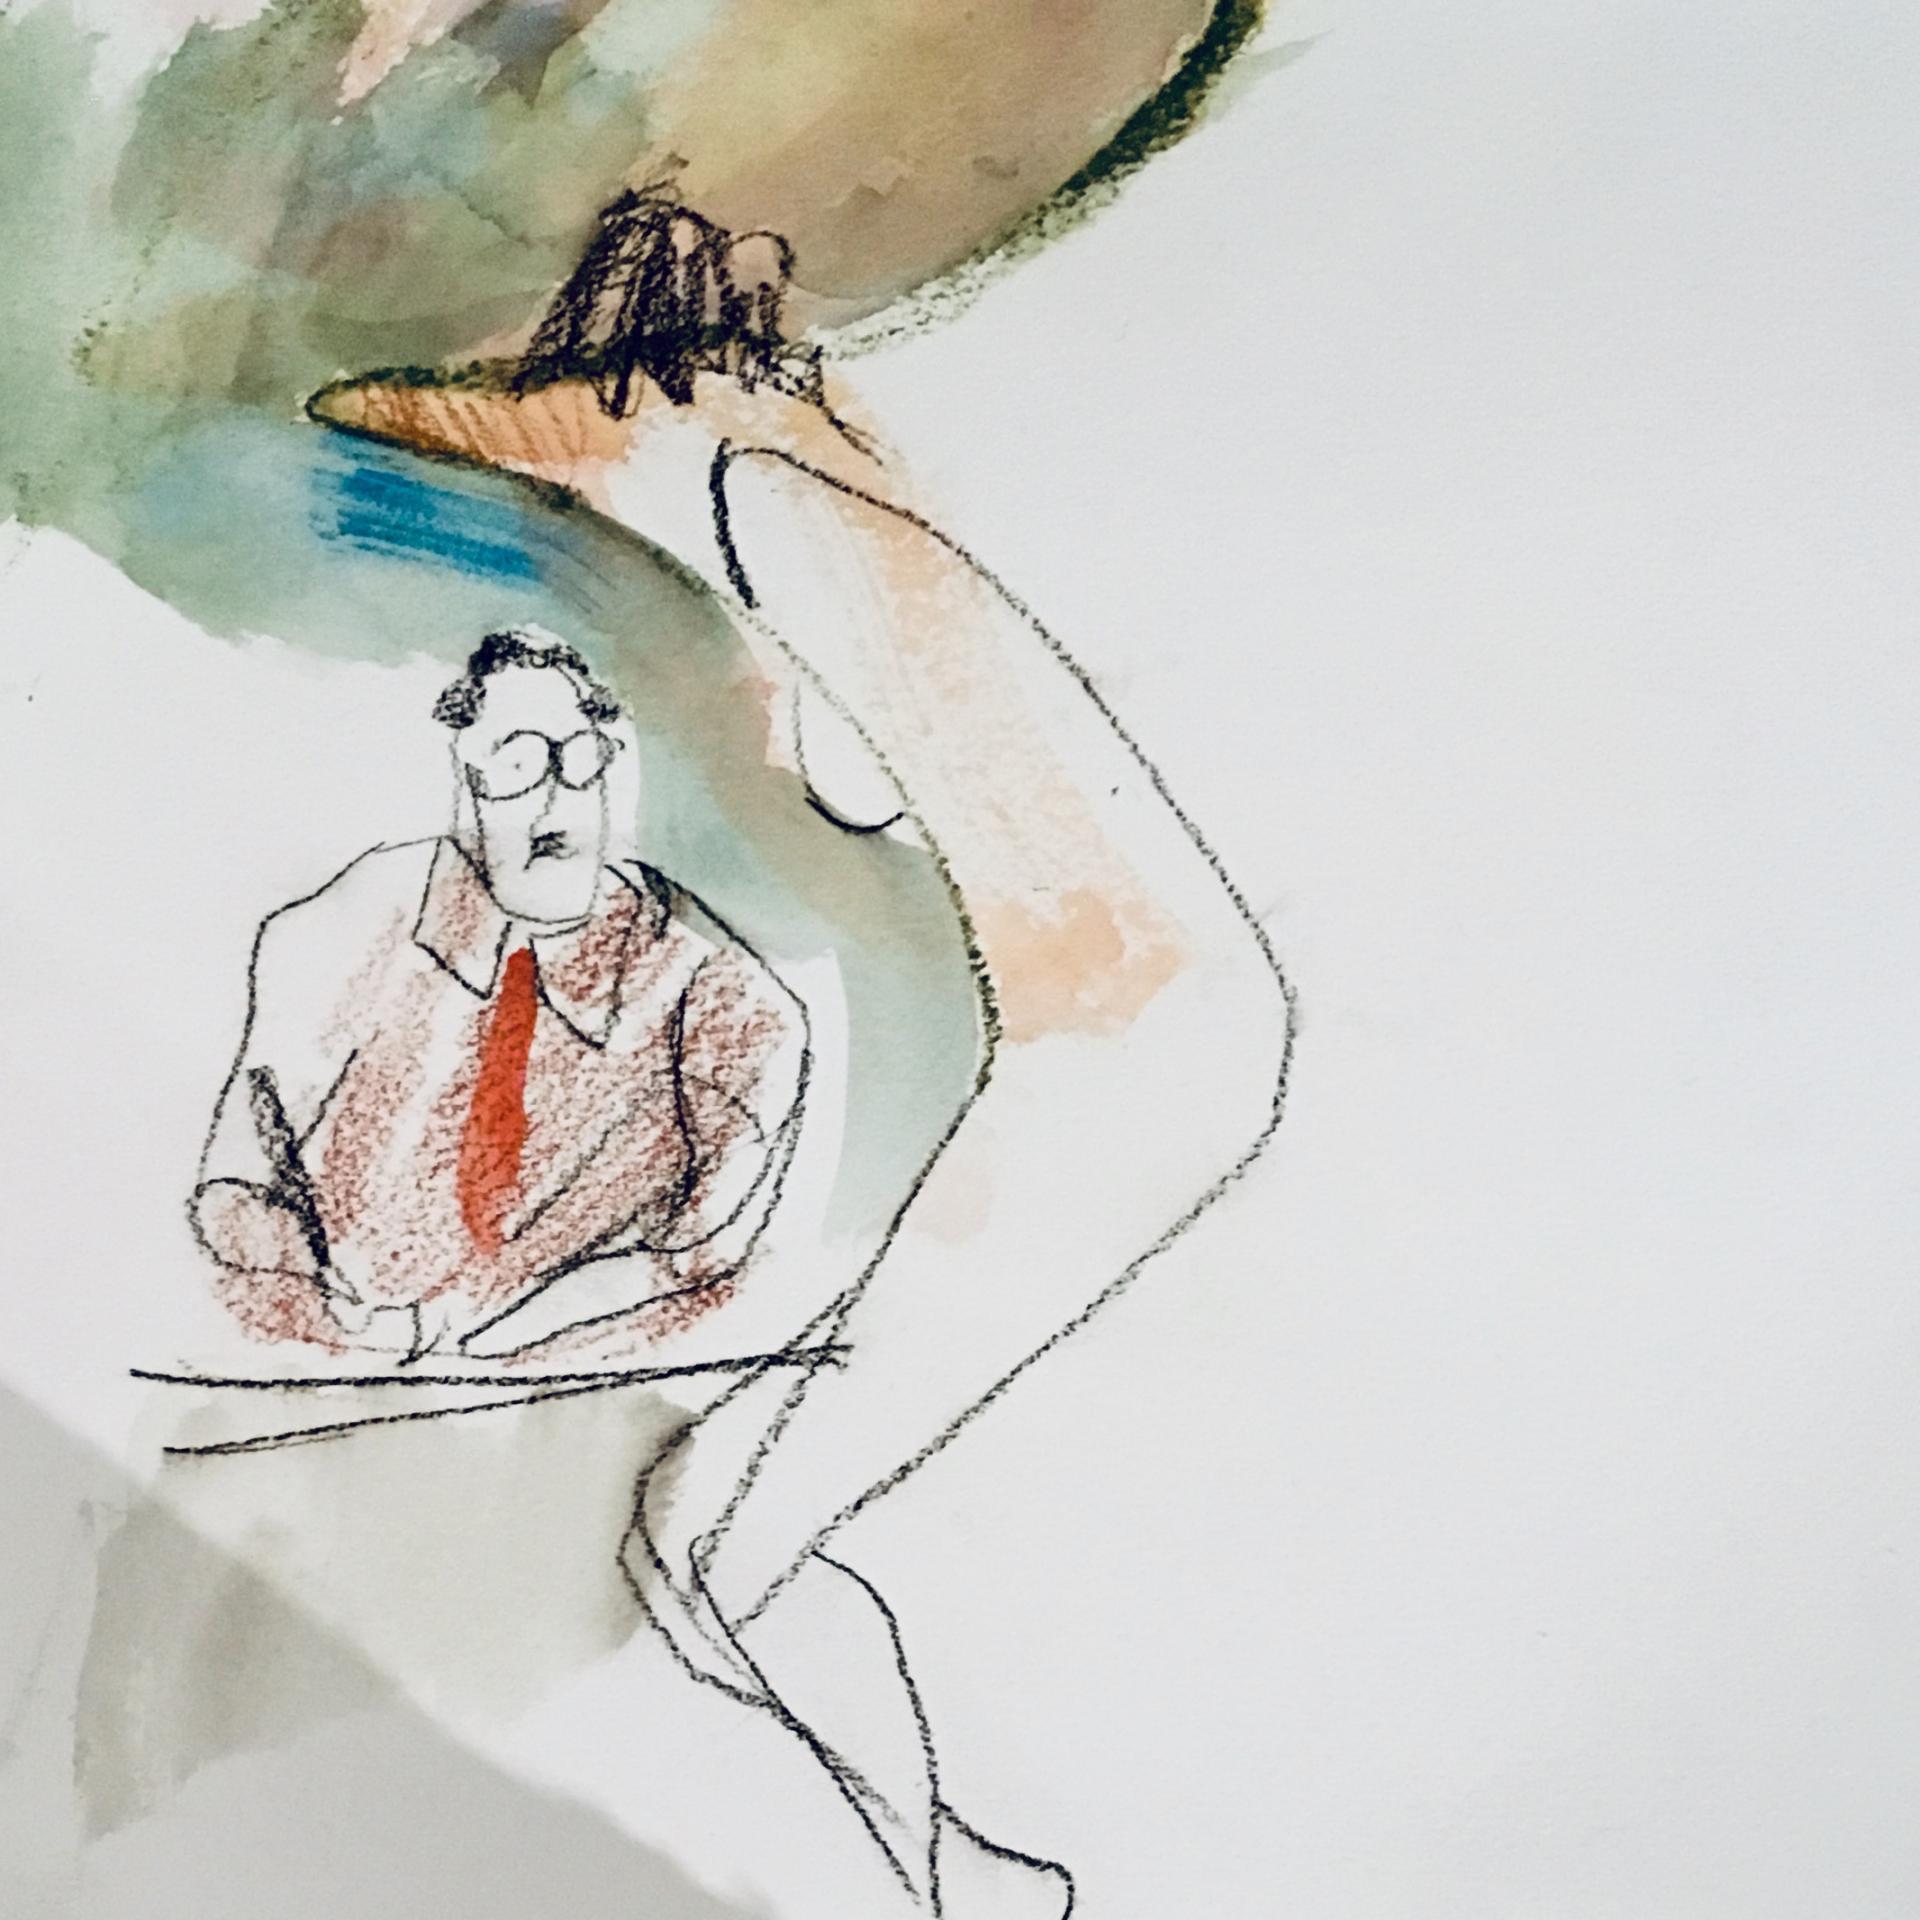 Oscar sketching